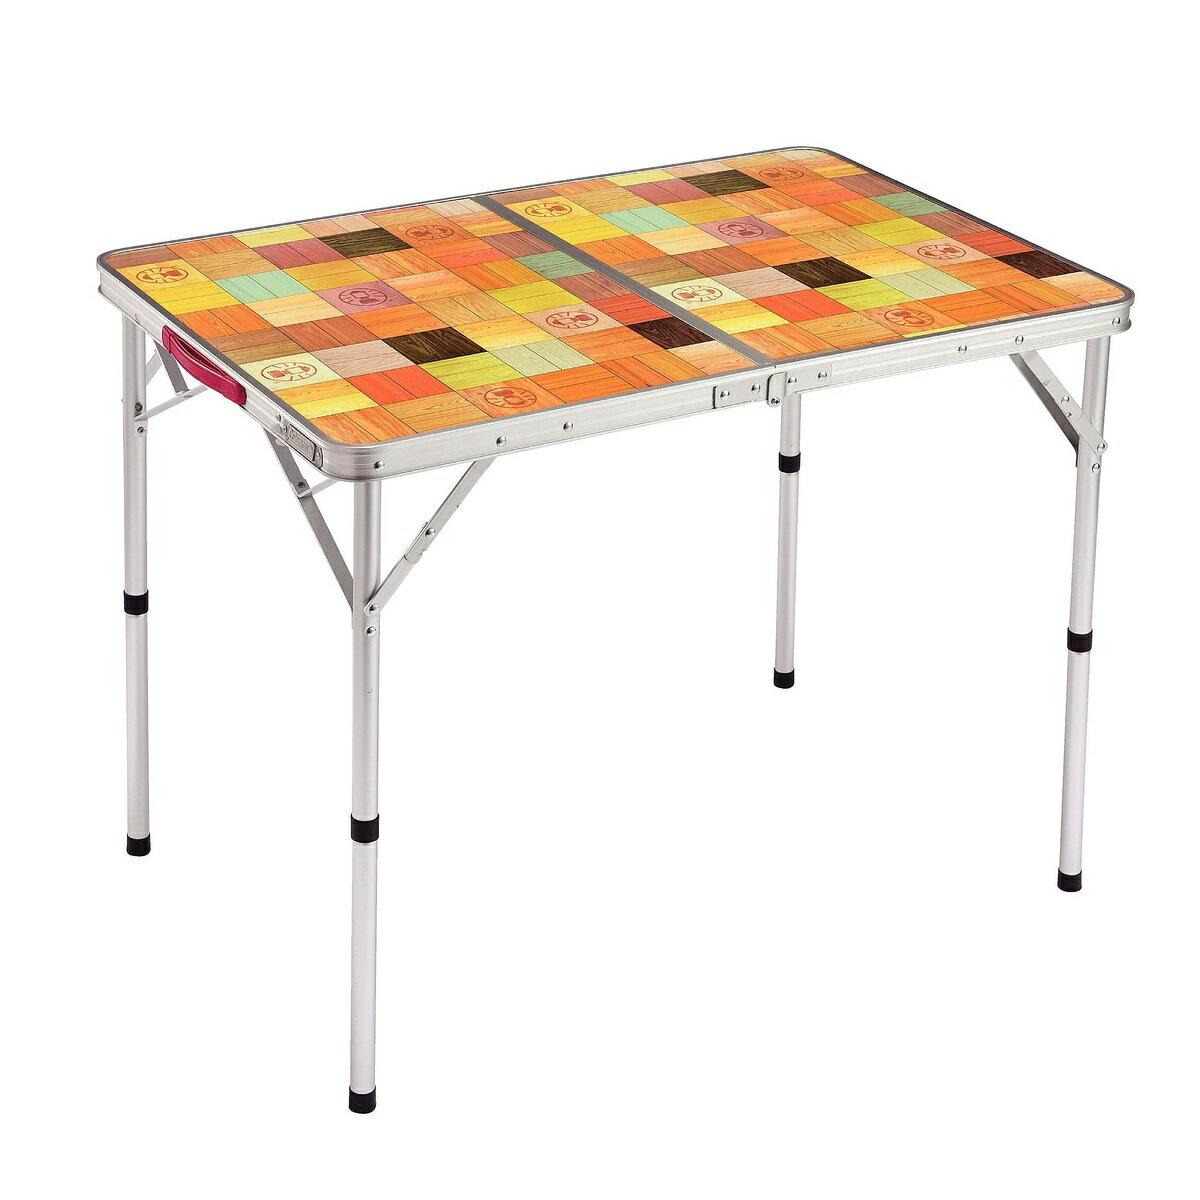 ● COLEMAN (コールマン) キャンプ用品 ファミリーテーブル ナチュラルモザイクリビングテーブル/90プラス 2000026752